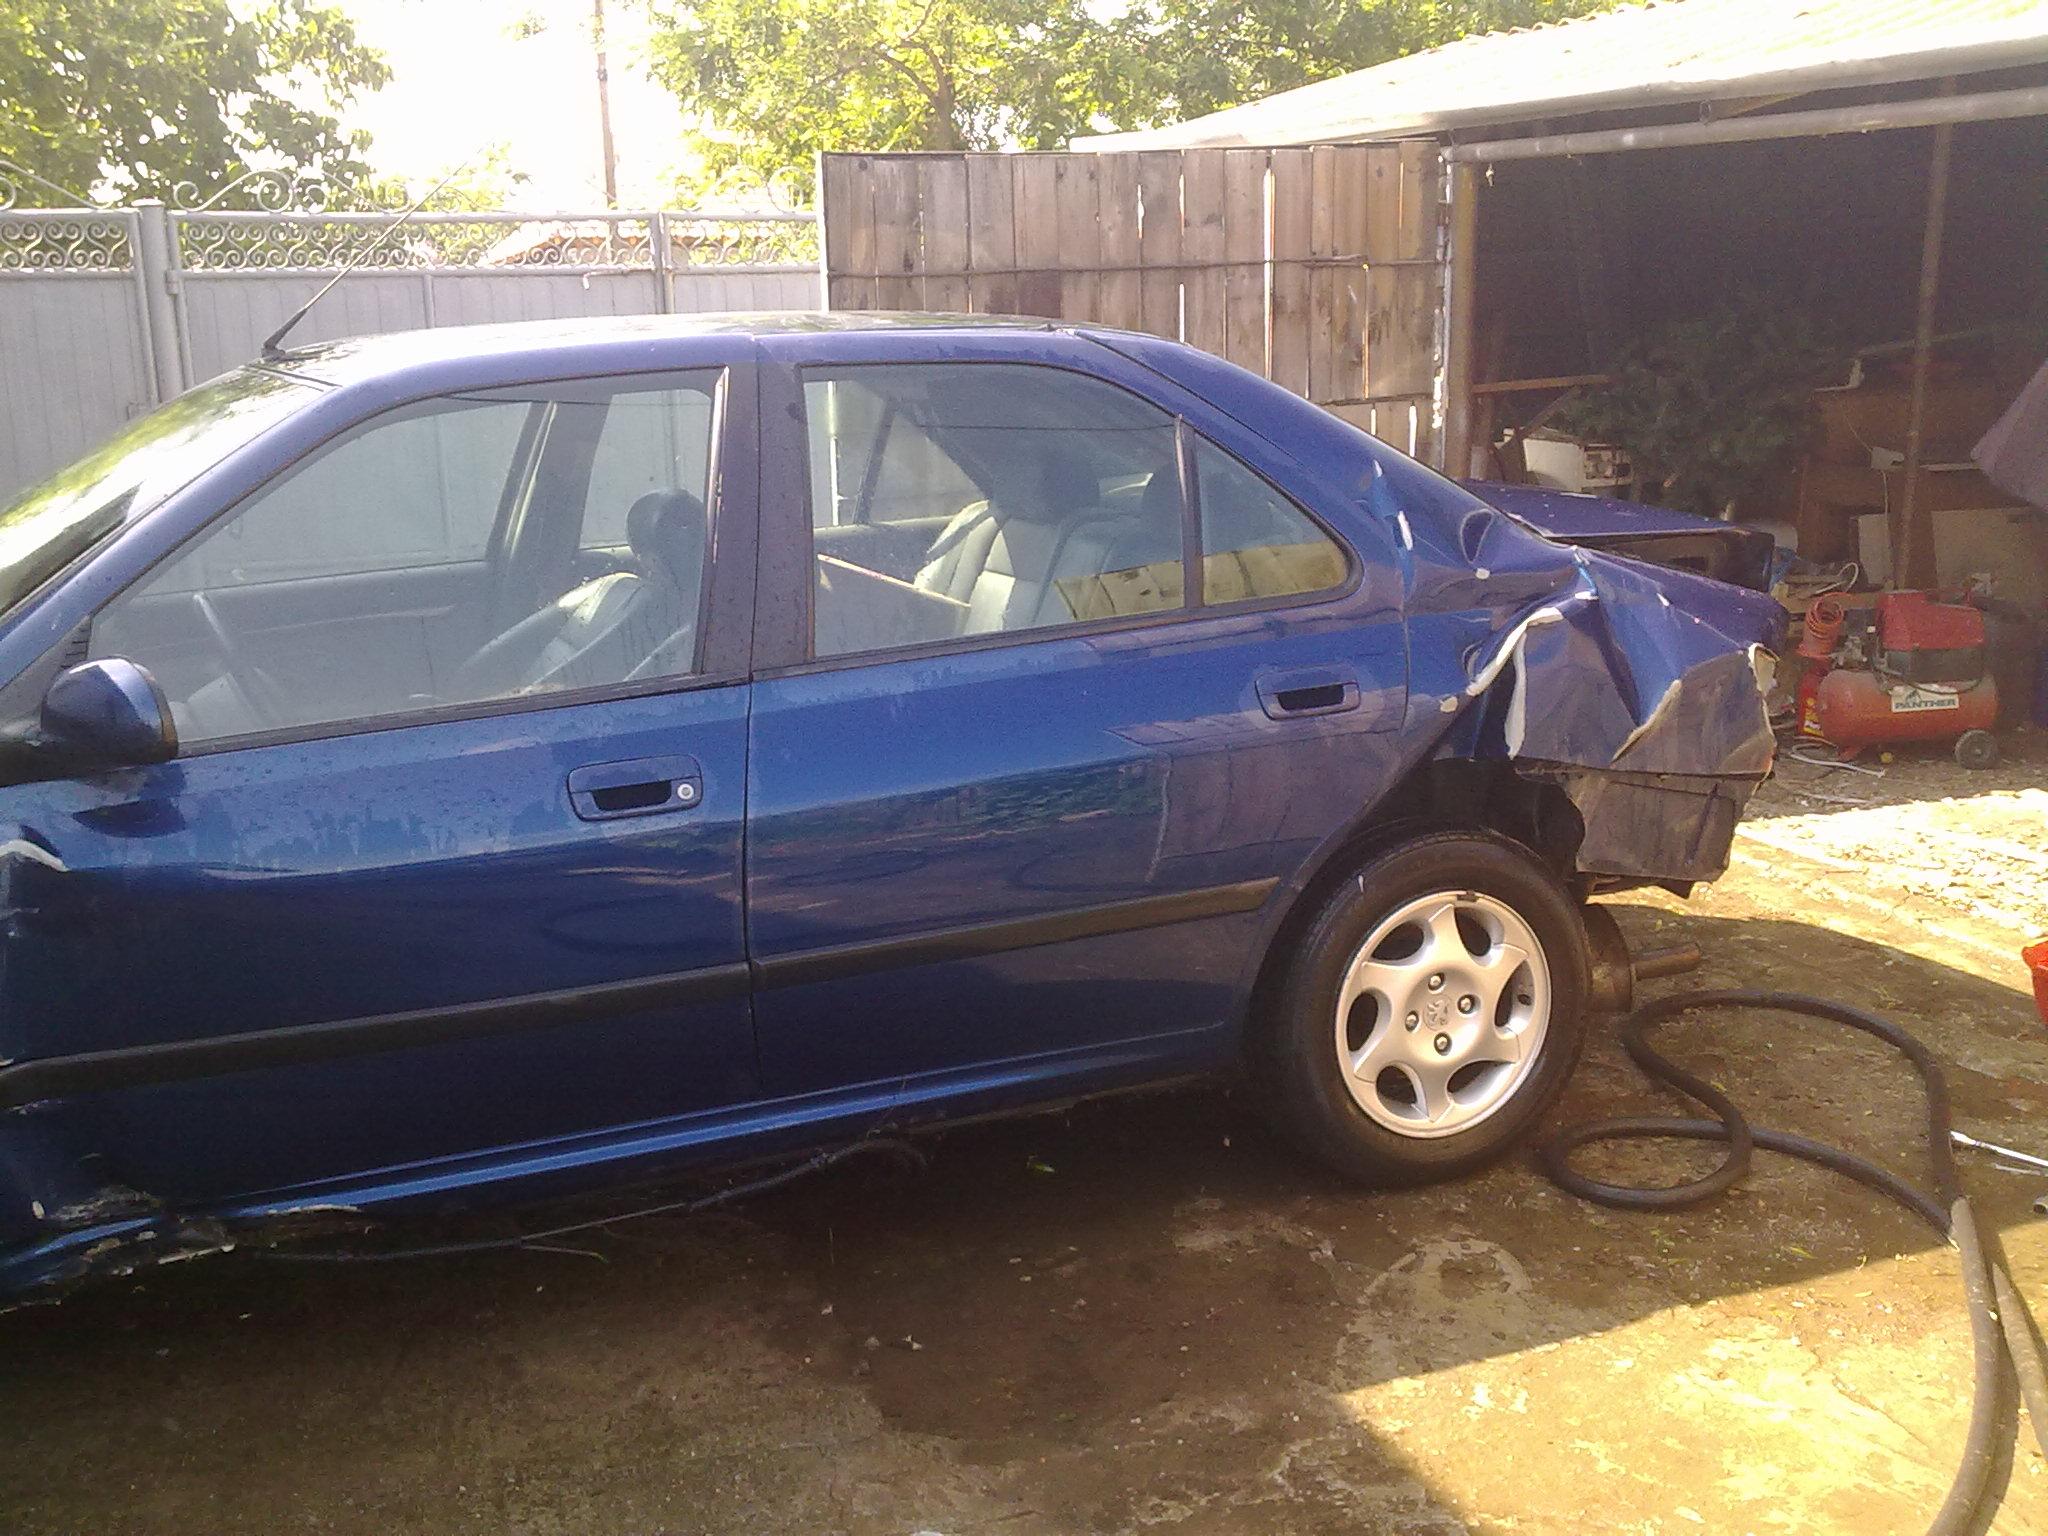 Peugeot 406 avariat 1997 Benzina Berlina - 04 Iunie 2011 - Poza 1